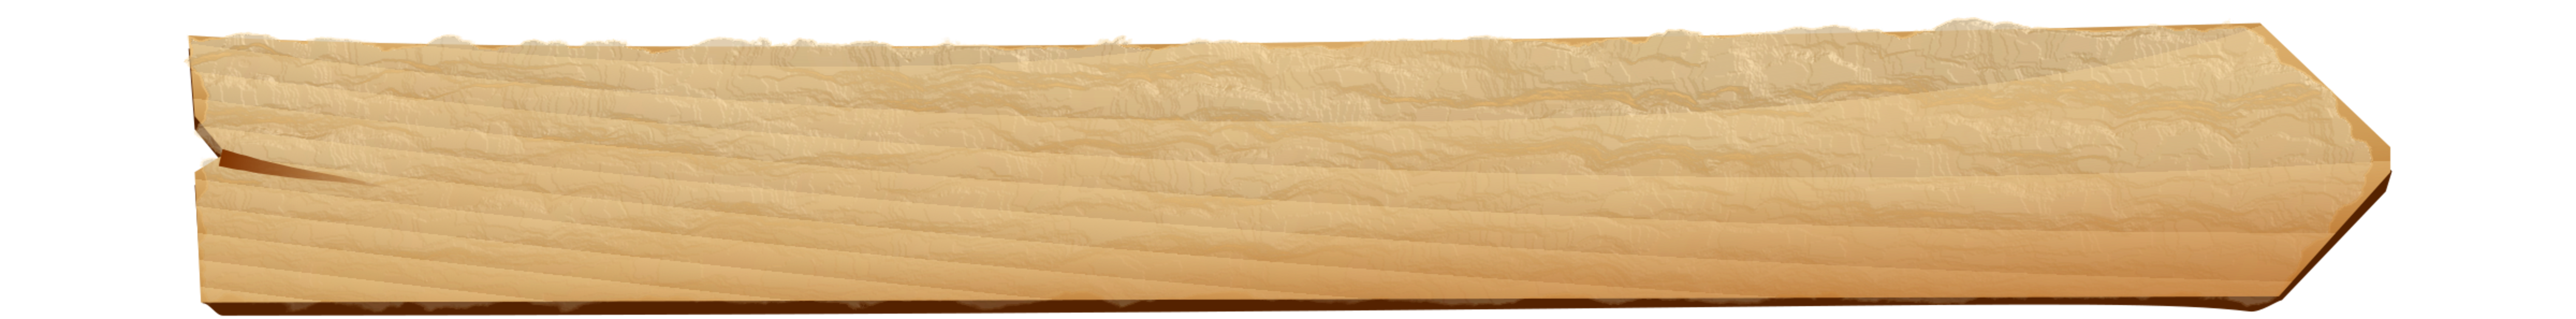 Wood,Angle,Material